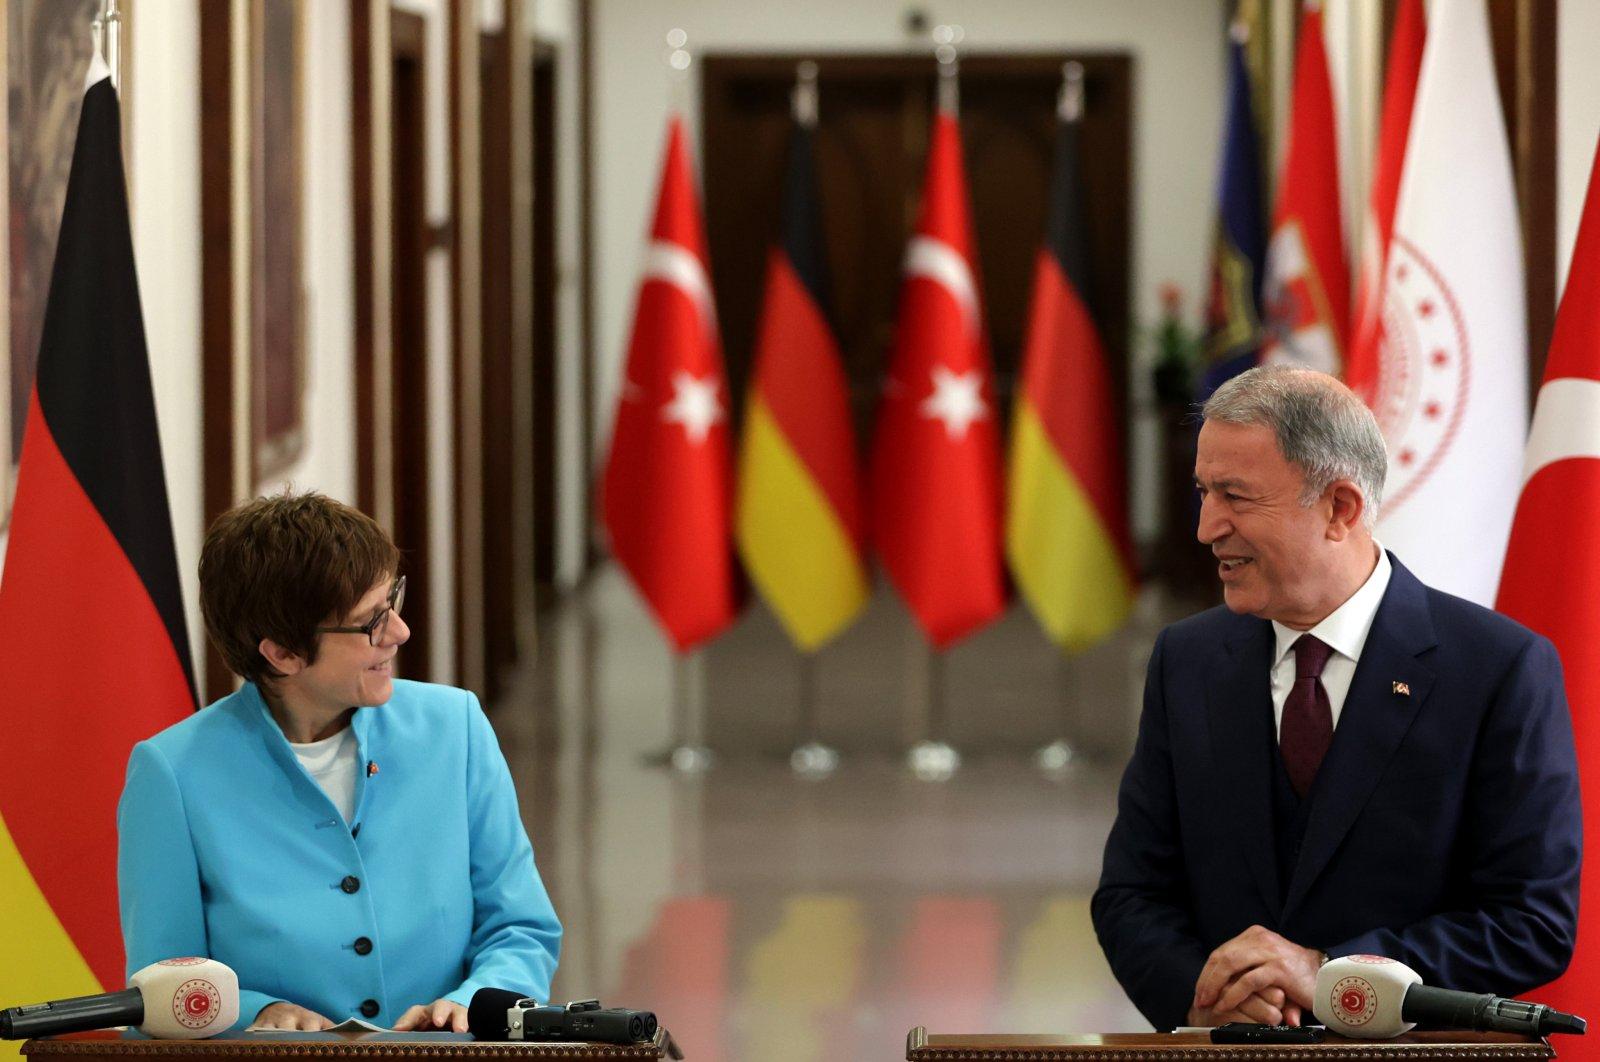 National Defense Minister Hulusi Akar and his German counterpart Annegret Kramp-Karrenbauer speak at a press conference in Ankara, Turkey, June 17, 2021. (AA Photo)